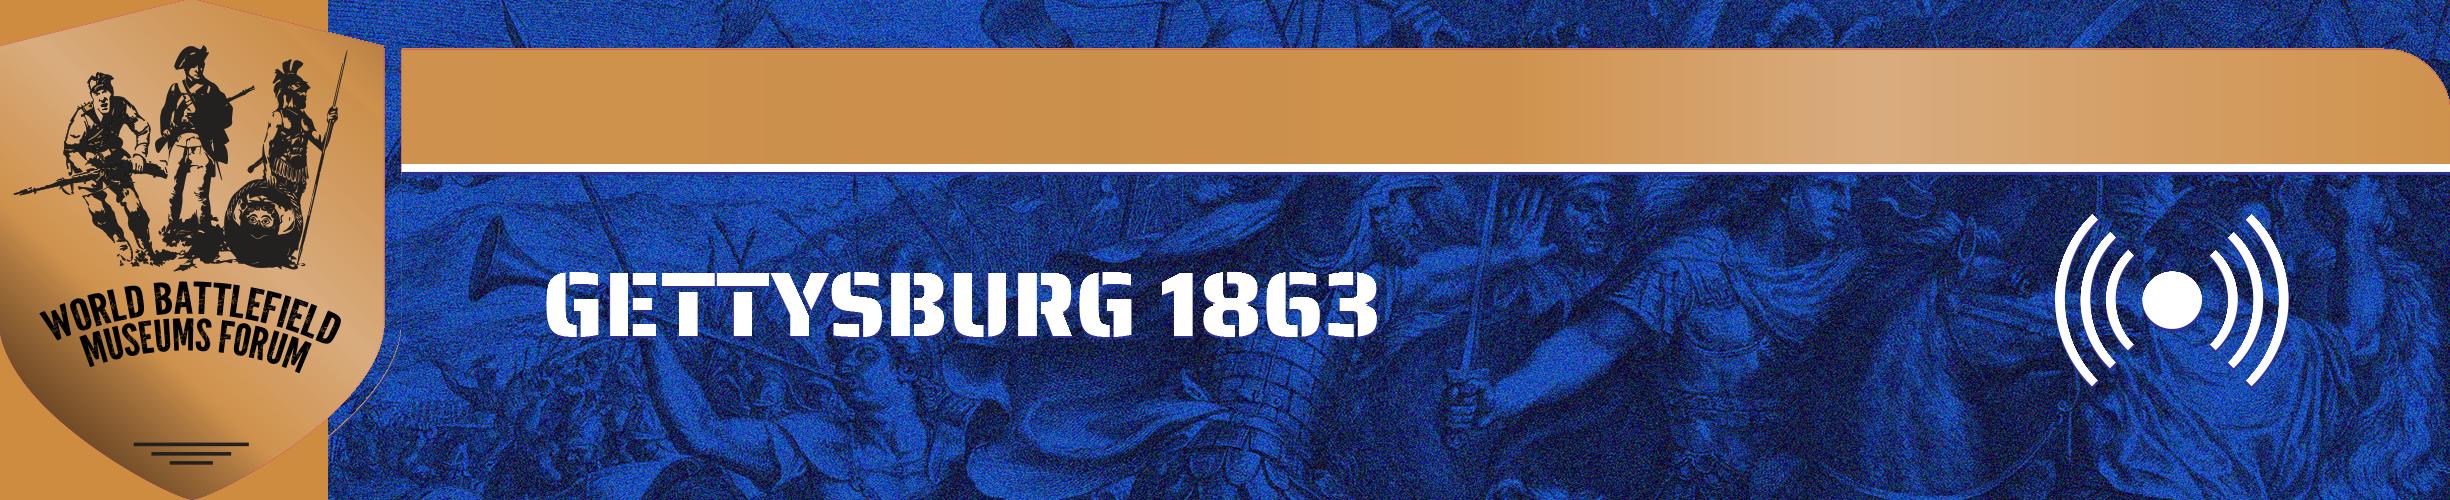 Audio Show Battle of Gettysburg 1863